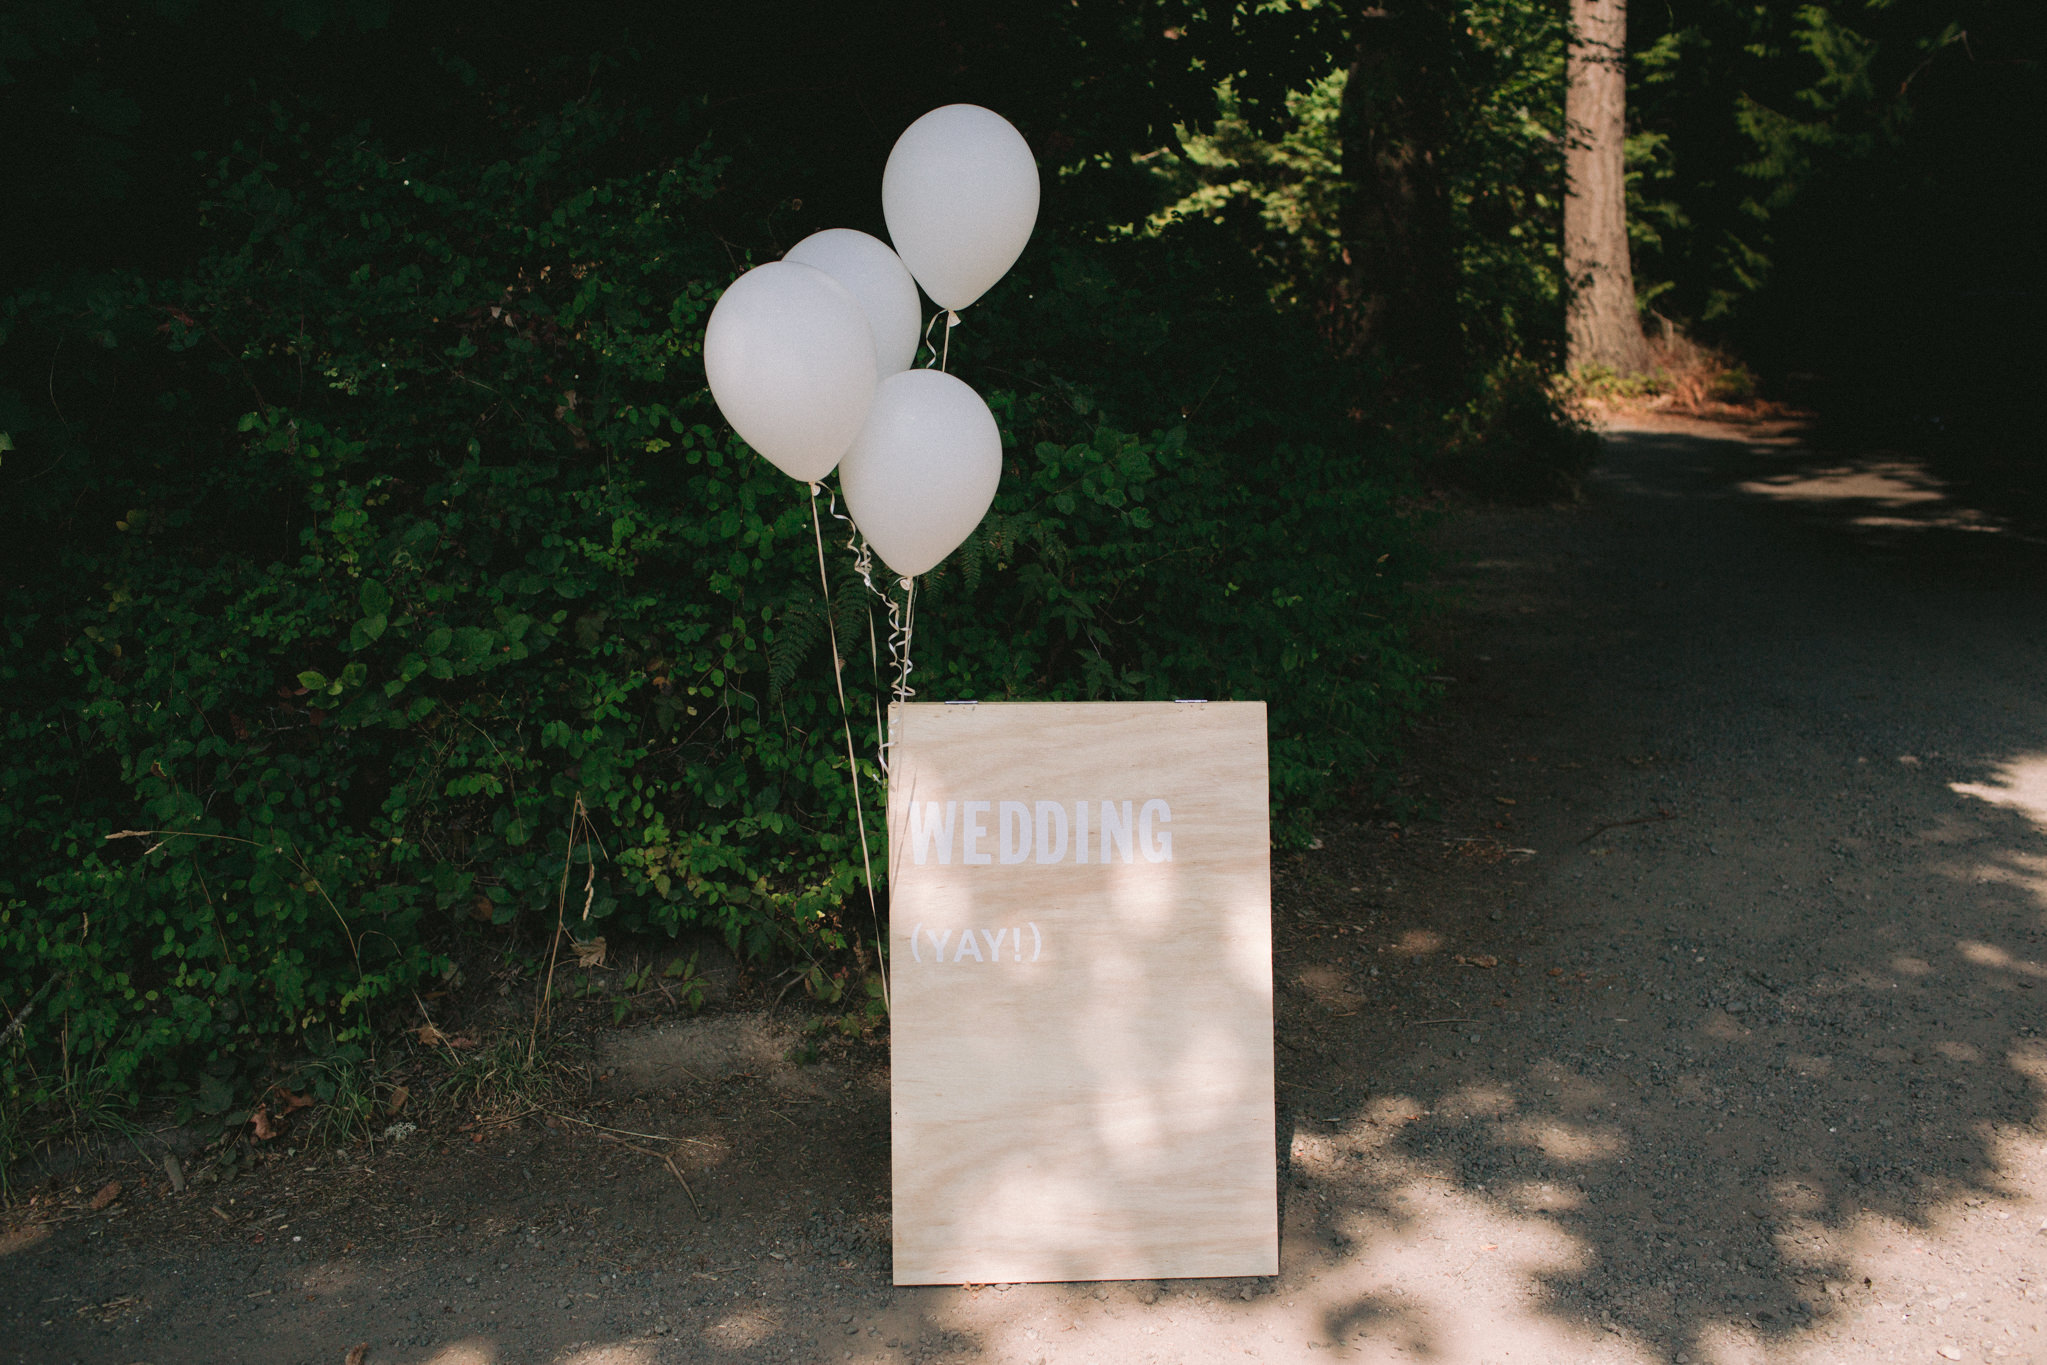 Backyard-Bainbridge-Island-Wedding-Alycia-Lovell-Photography-7.JPG